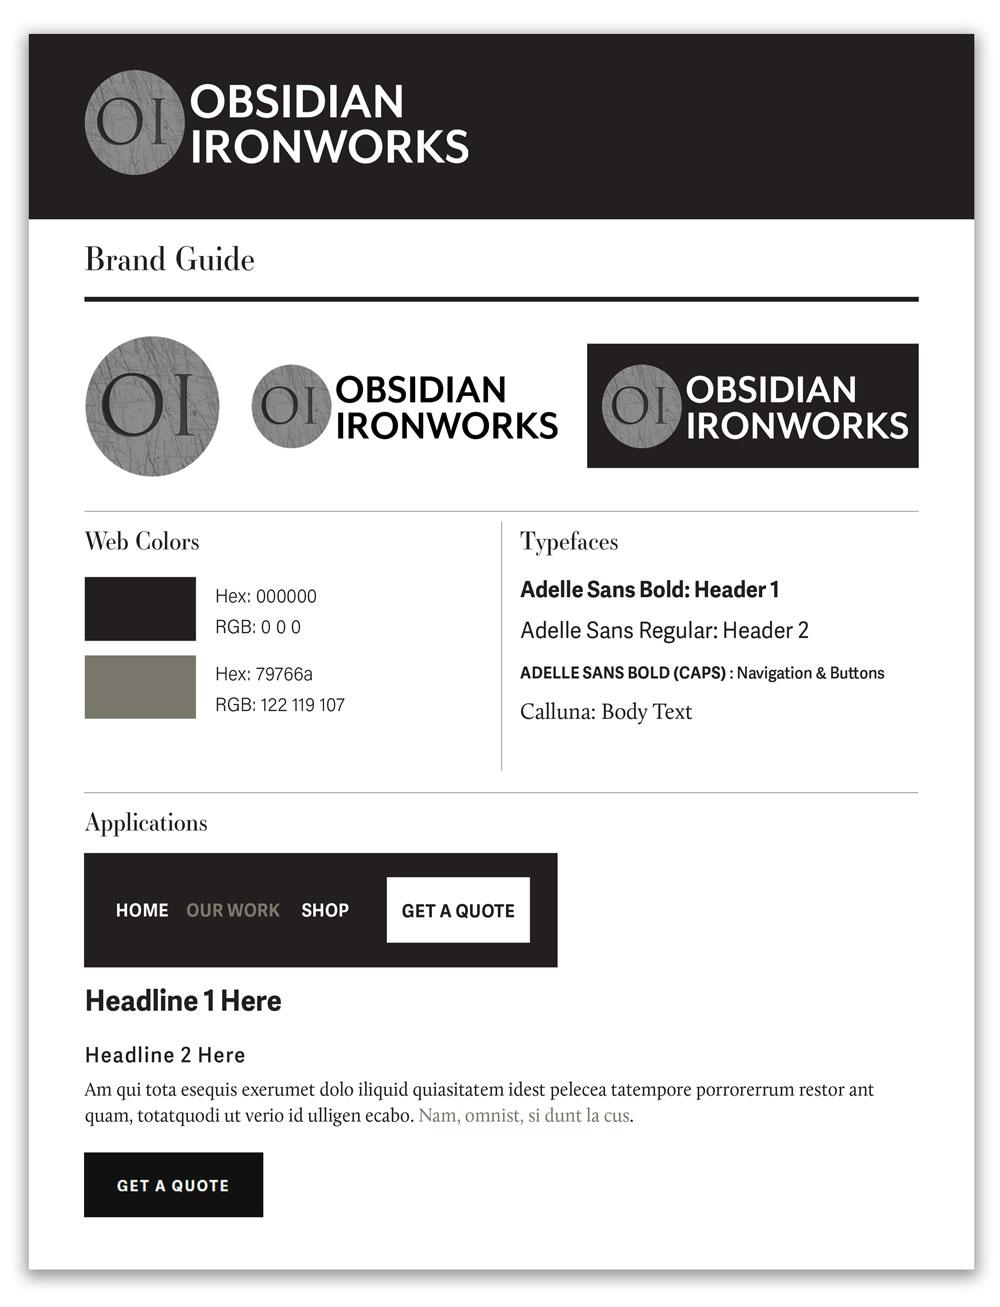 OI-Brand-Guide.jpg